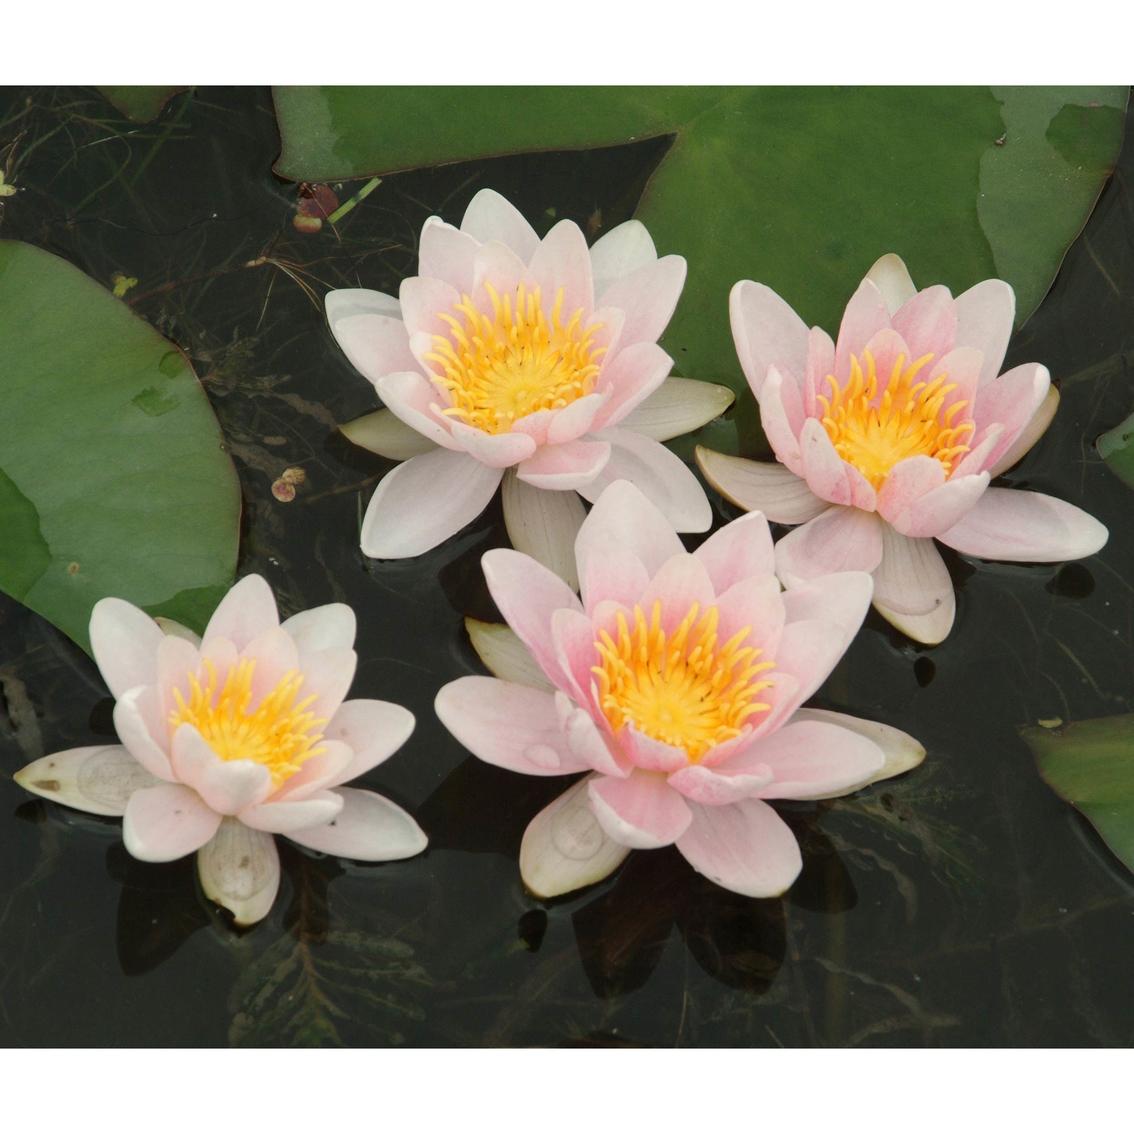 Van Zyverden Premium Series Water Lily Mary Patricia Kit Garden